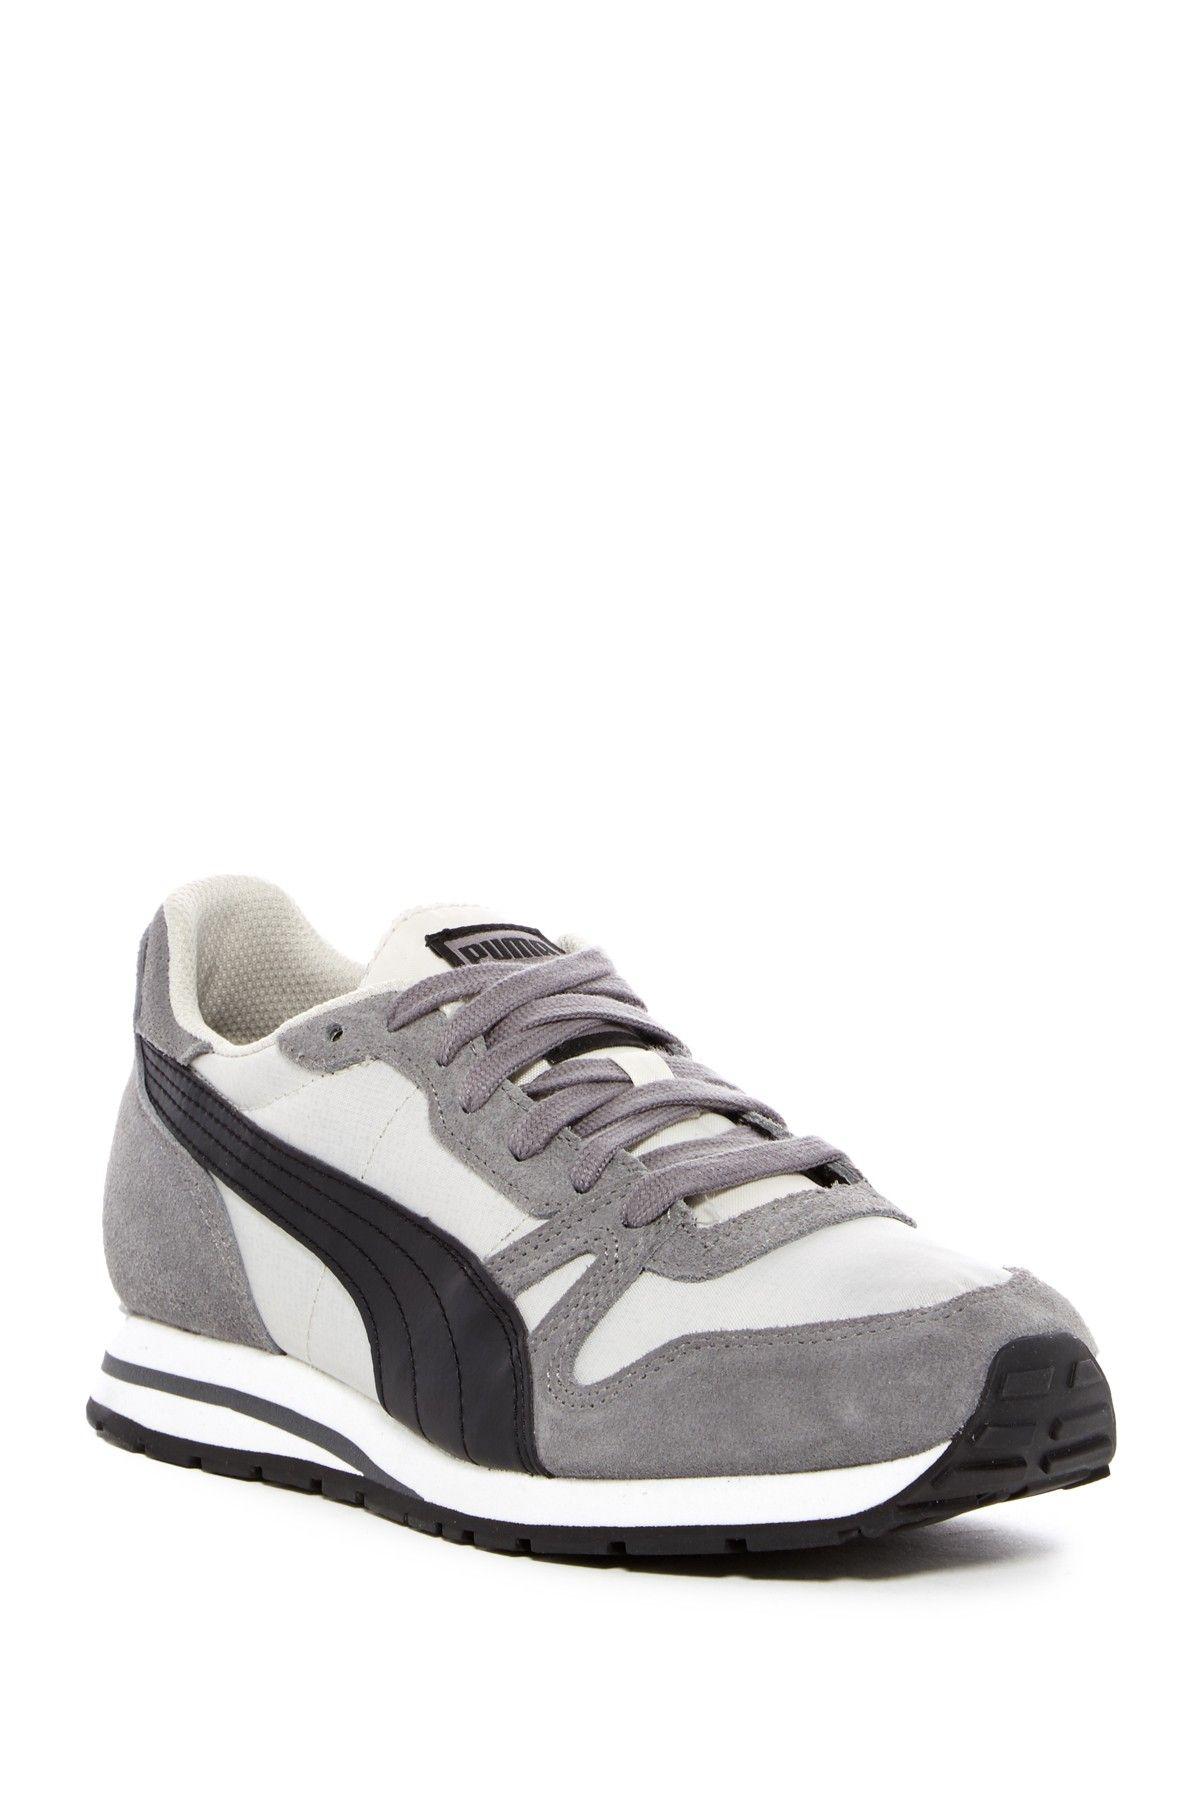 Classic sneakers, Sneakers, Puma